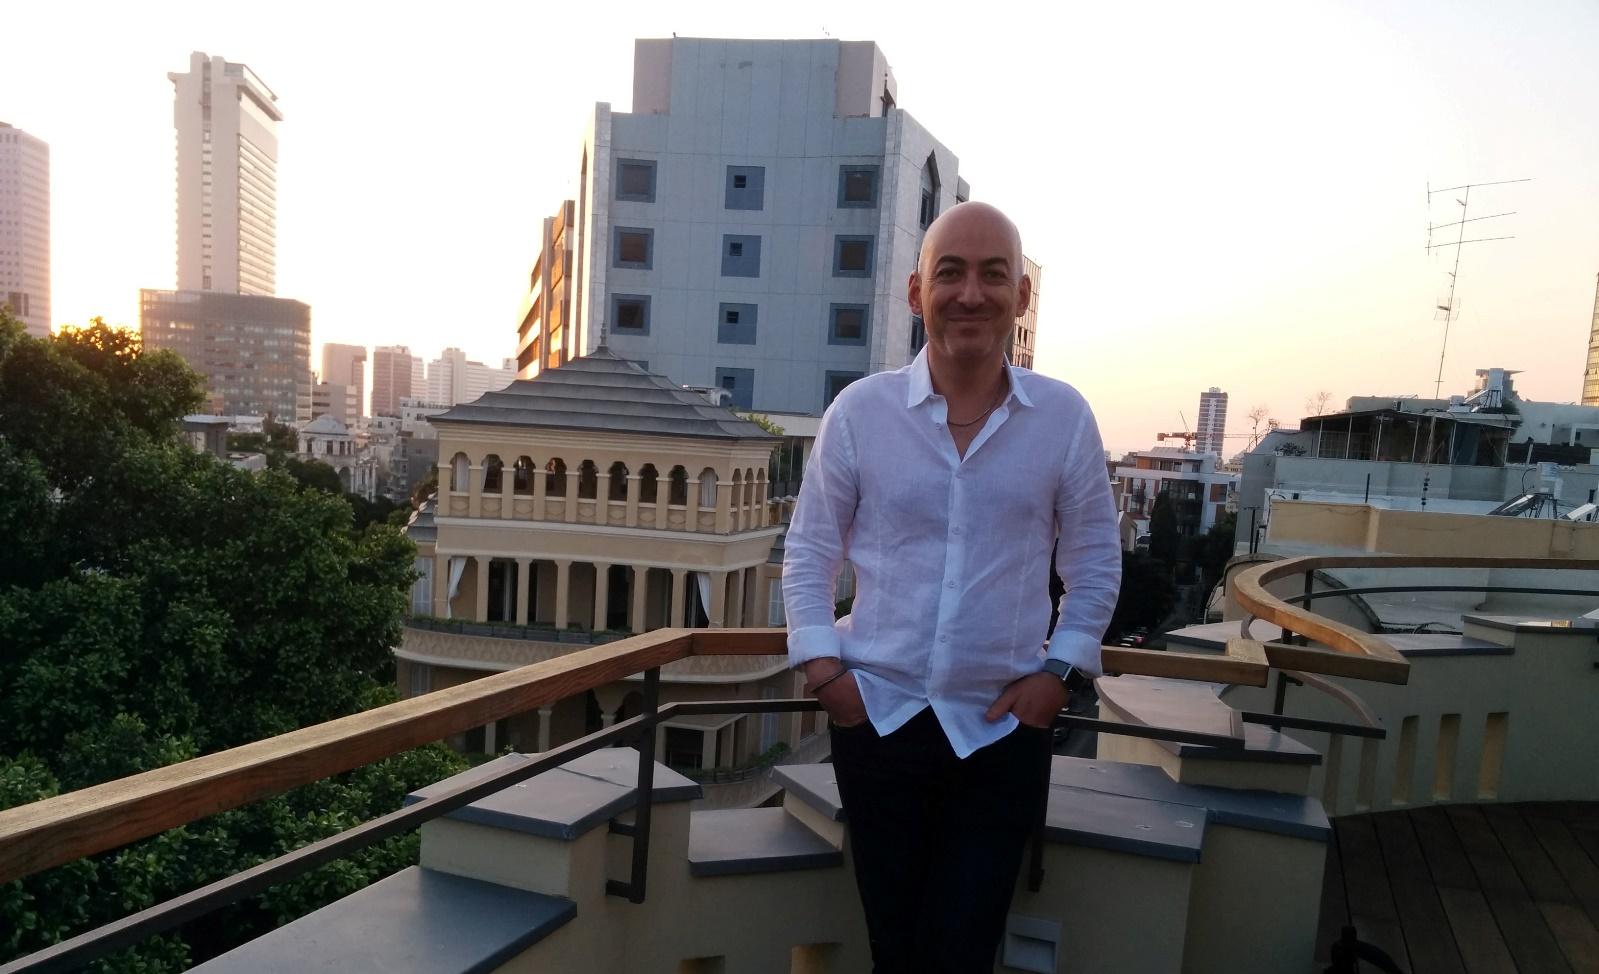 Shlomo Benartzi on the roof of The Norman Hotel in Tel Aviv. Photo by Abigail Klein Leichman